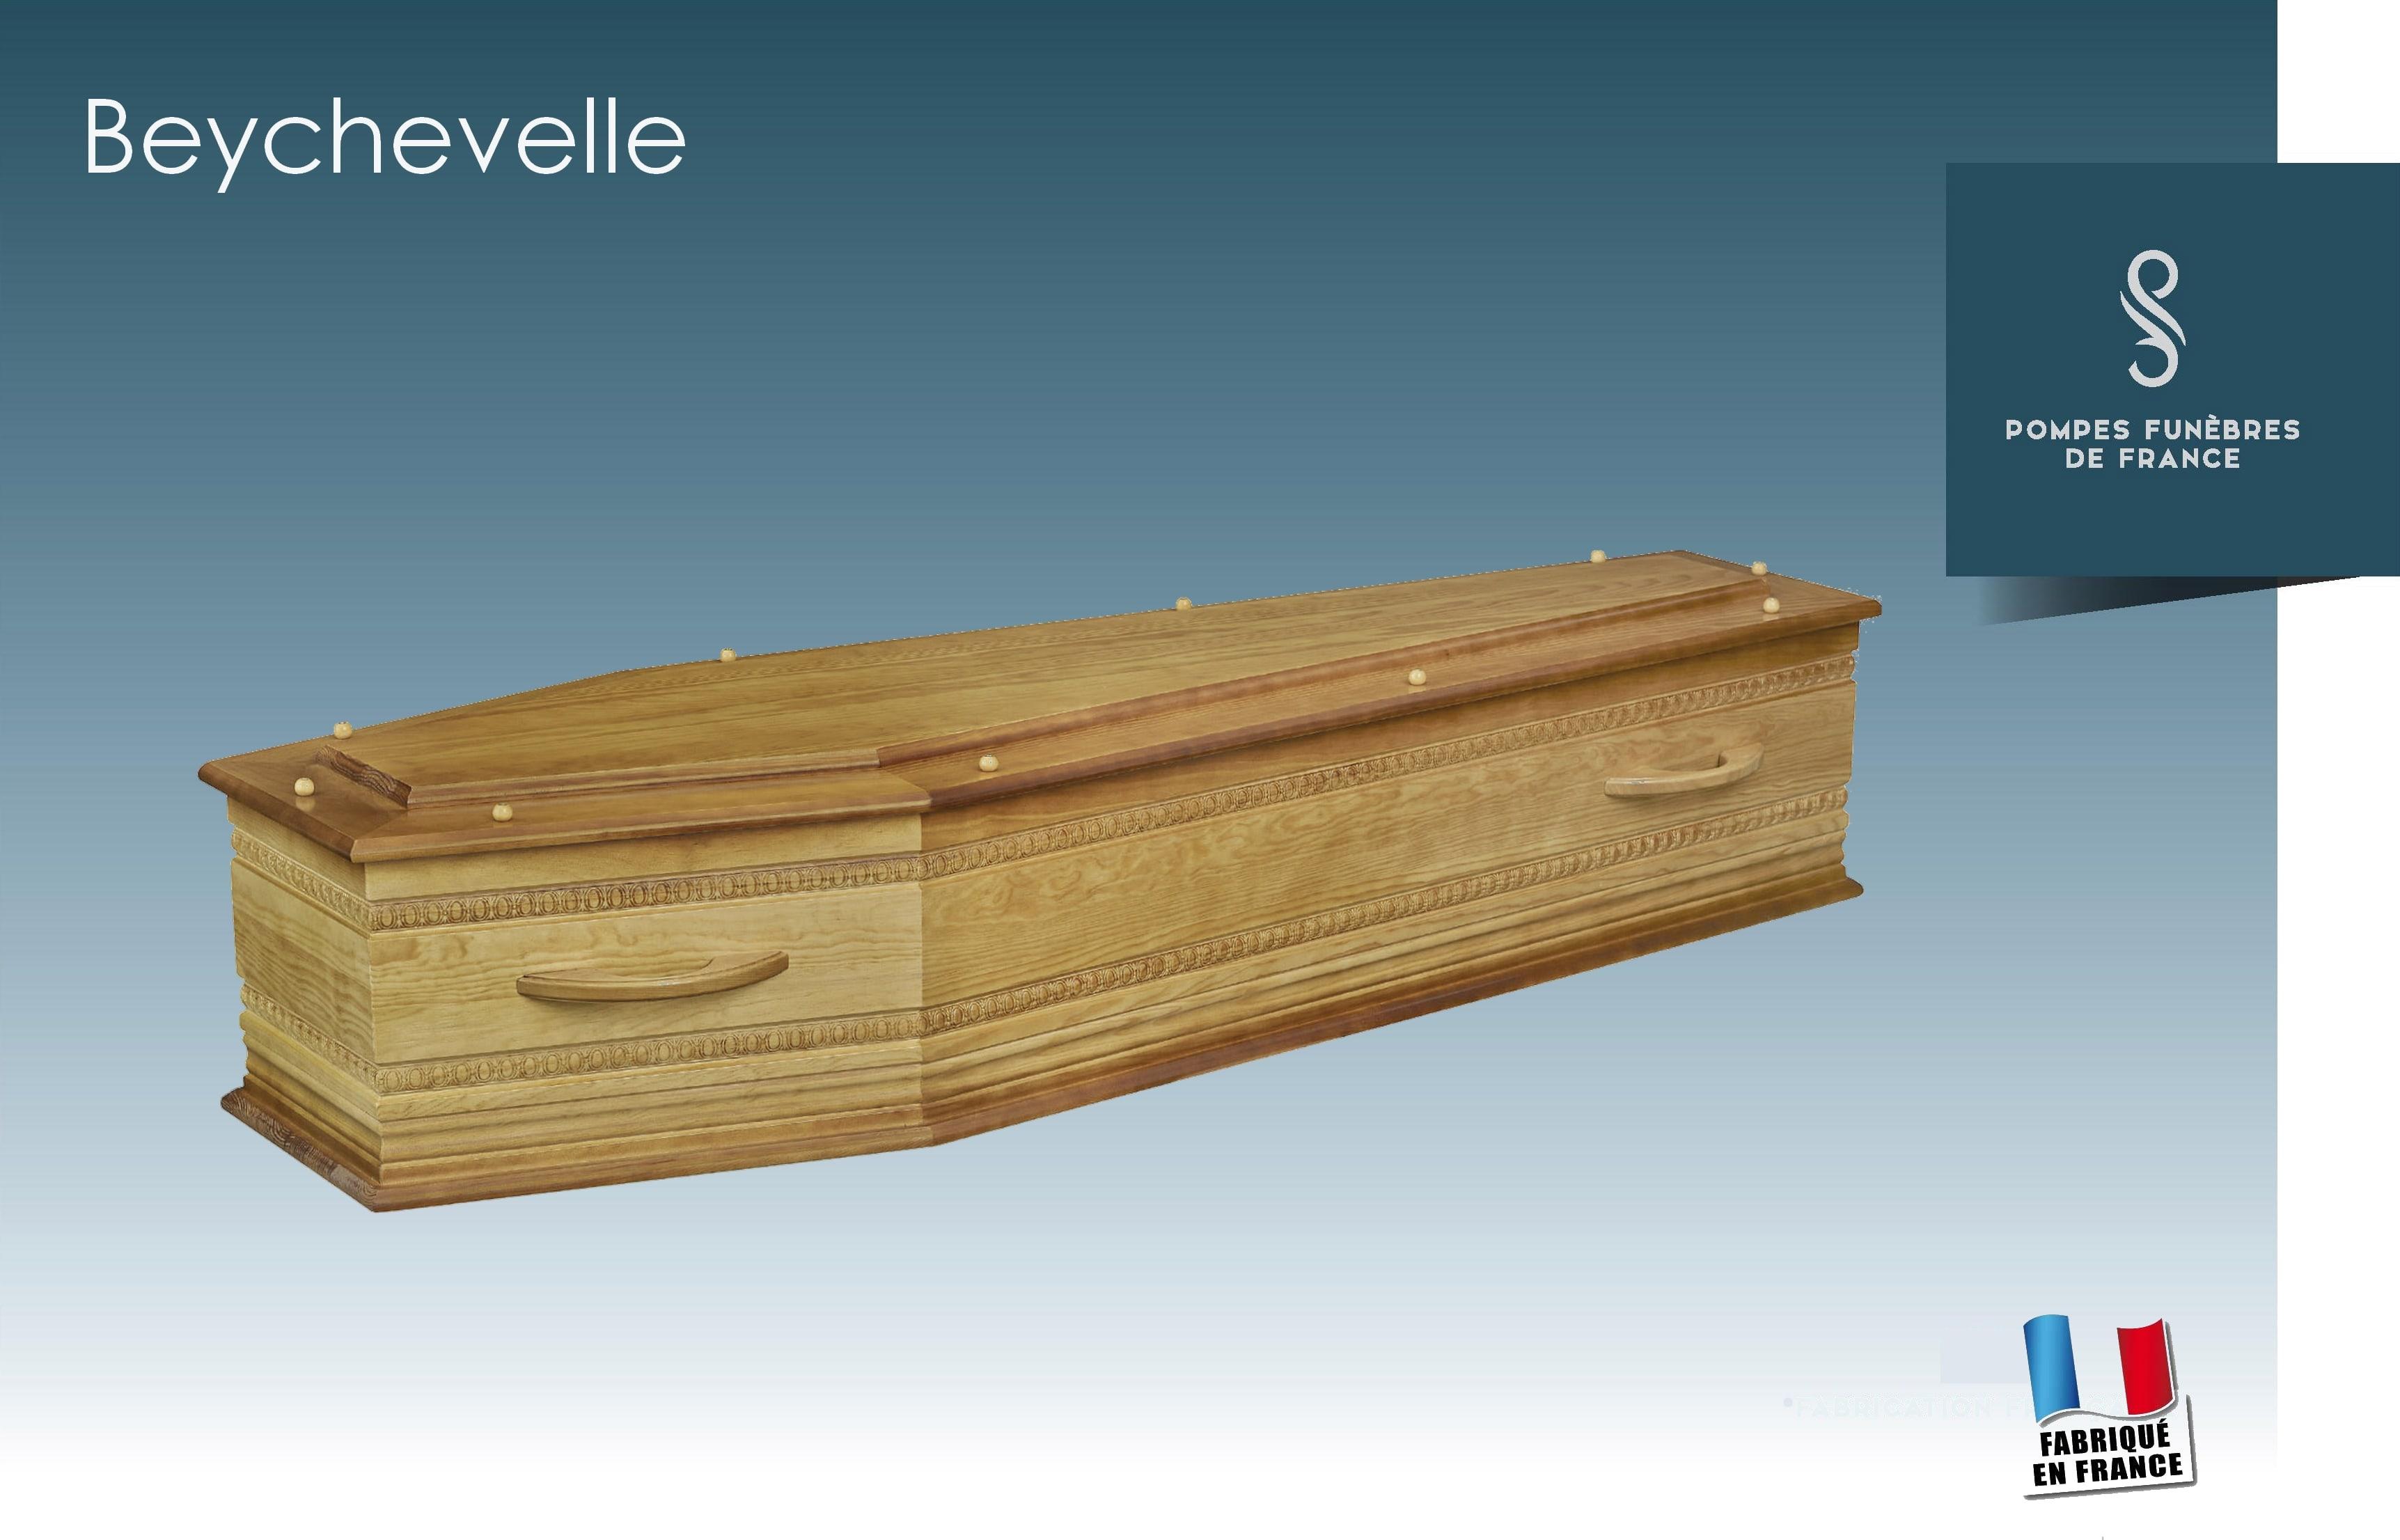 Cercueil Beychevelle